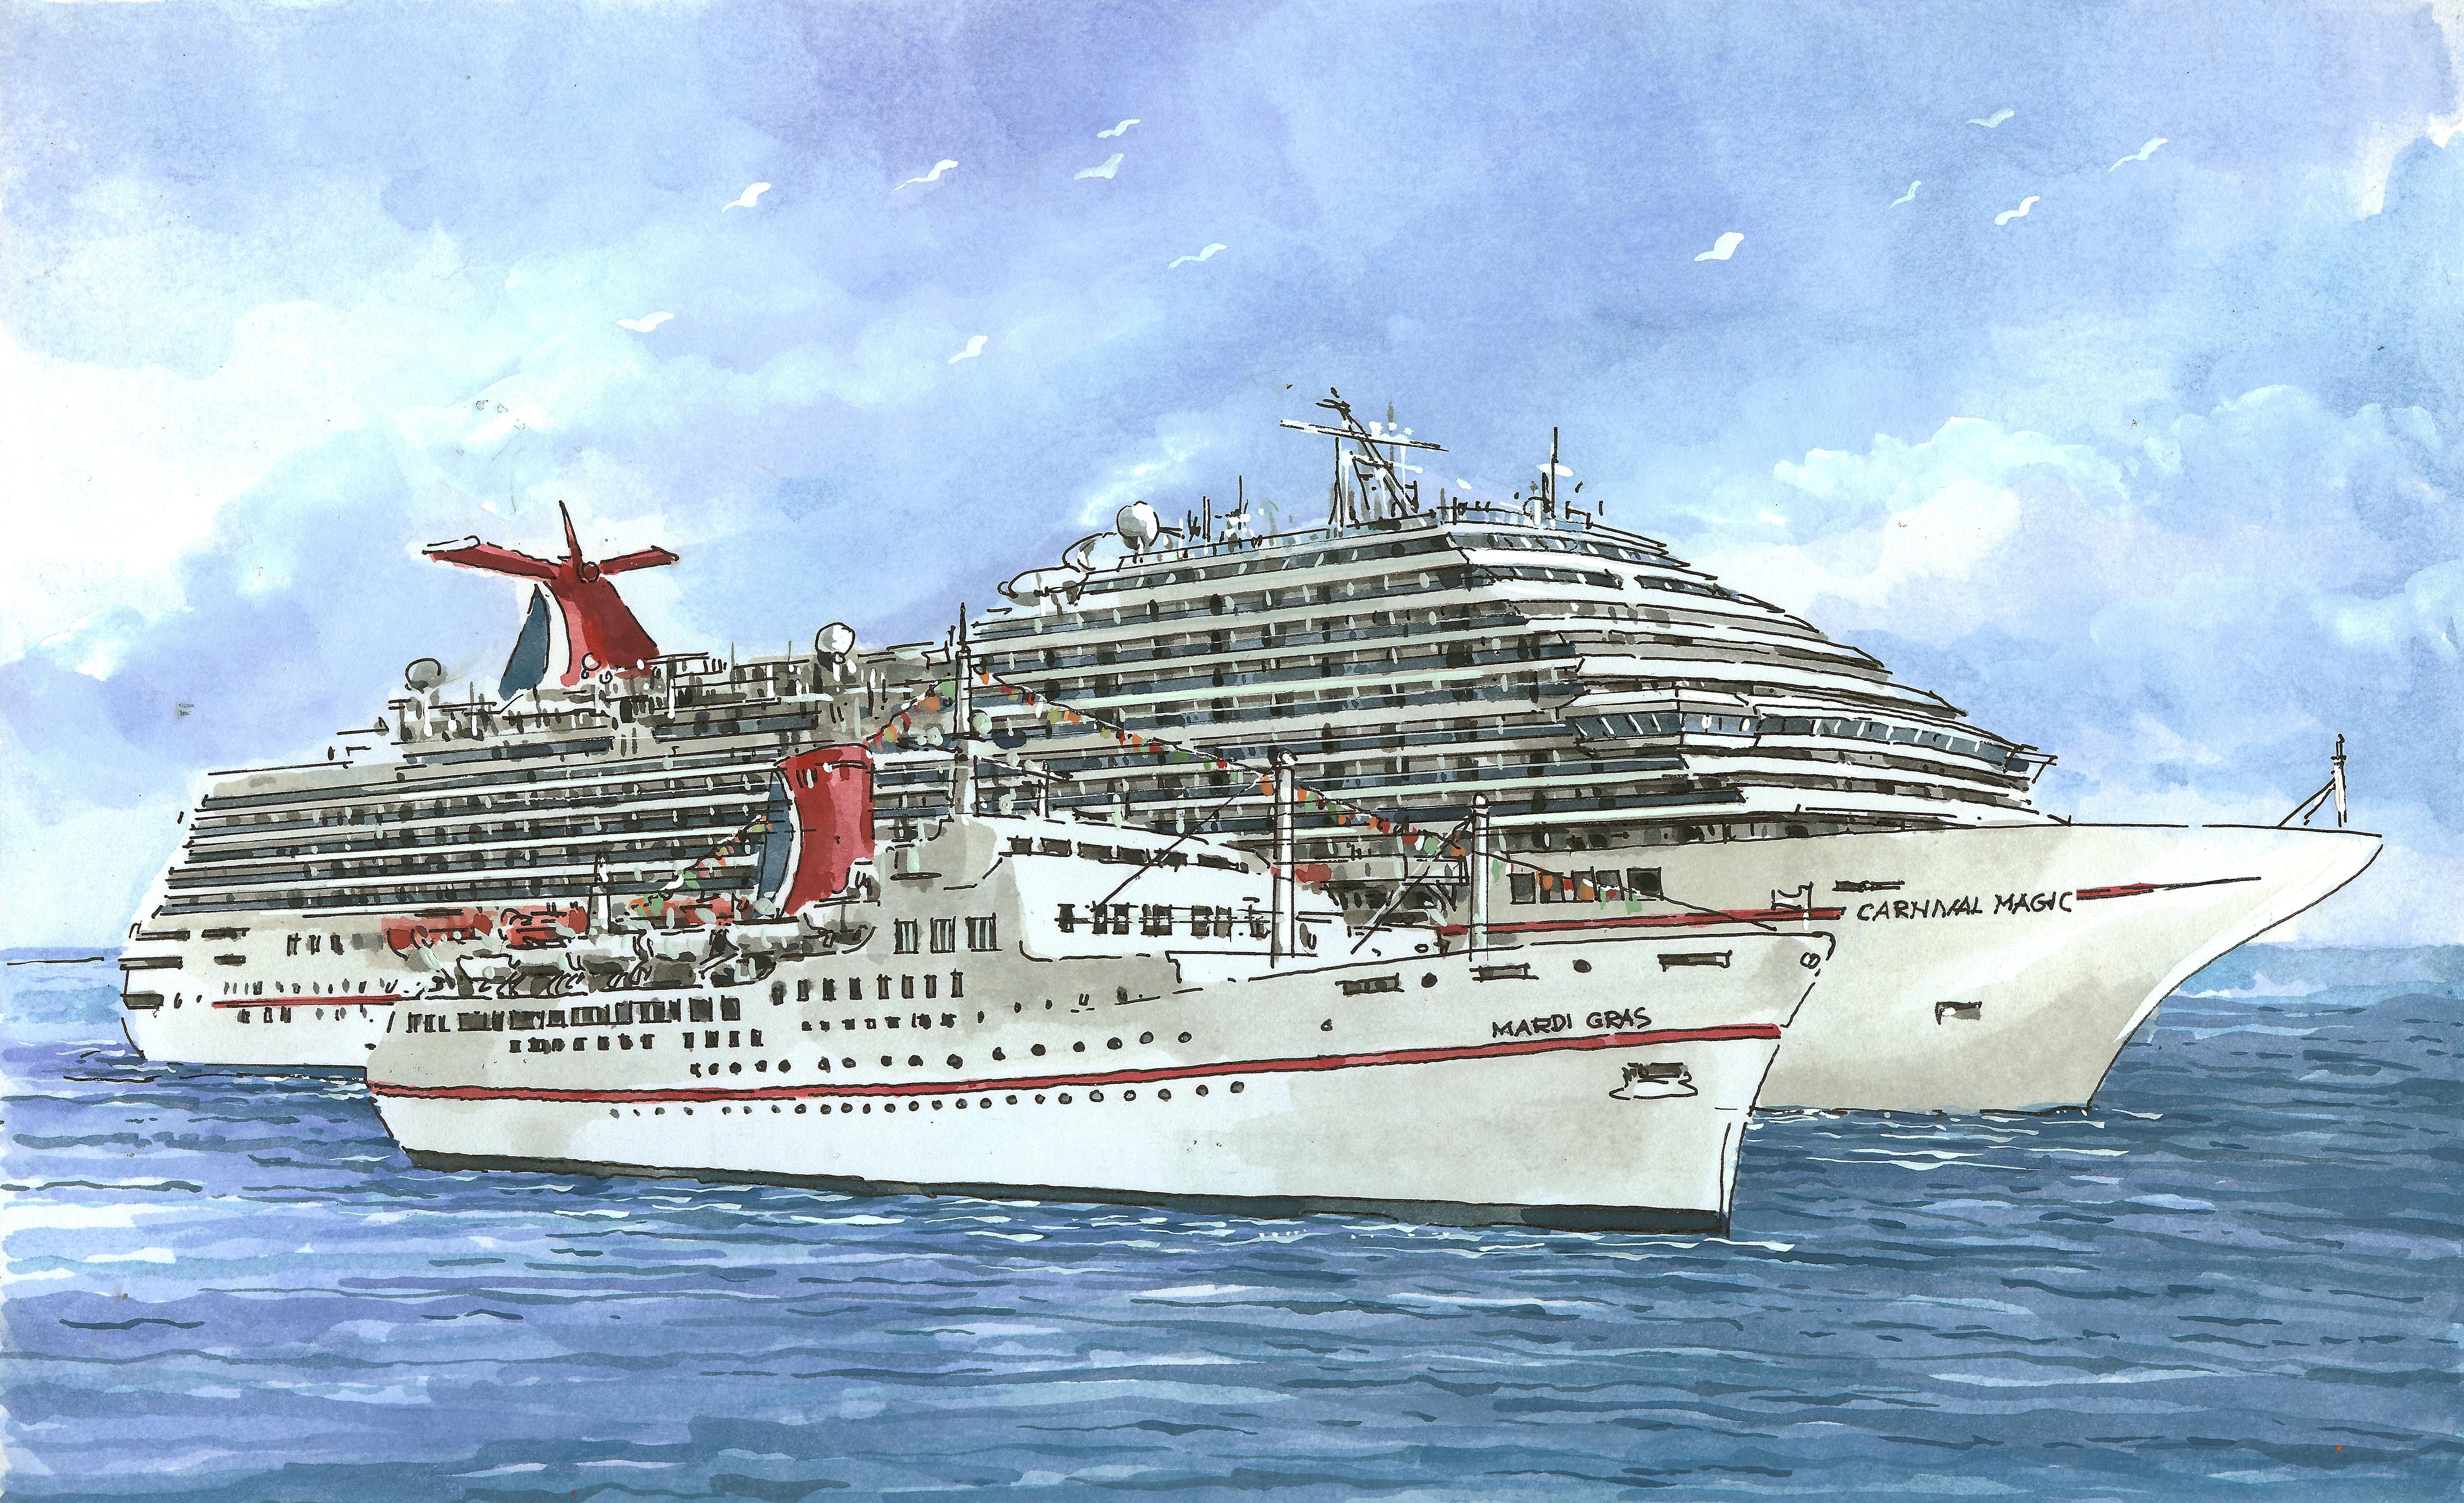 Carnival Cruise Ship Mardi Gras Fitbudha Com